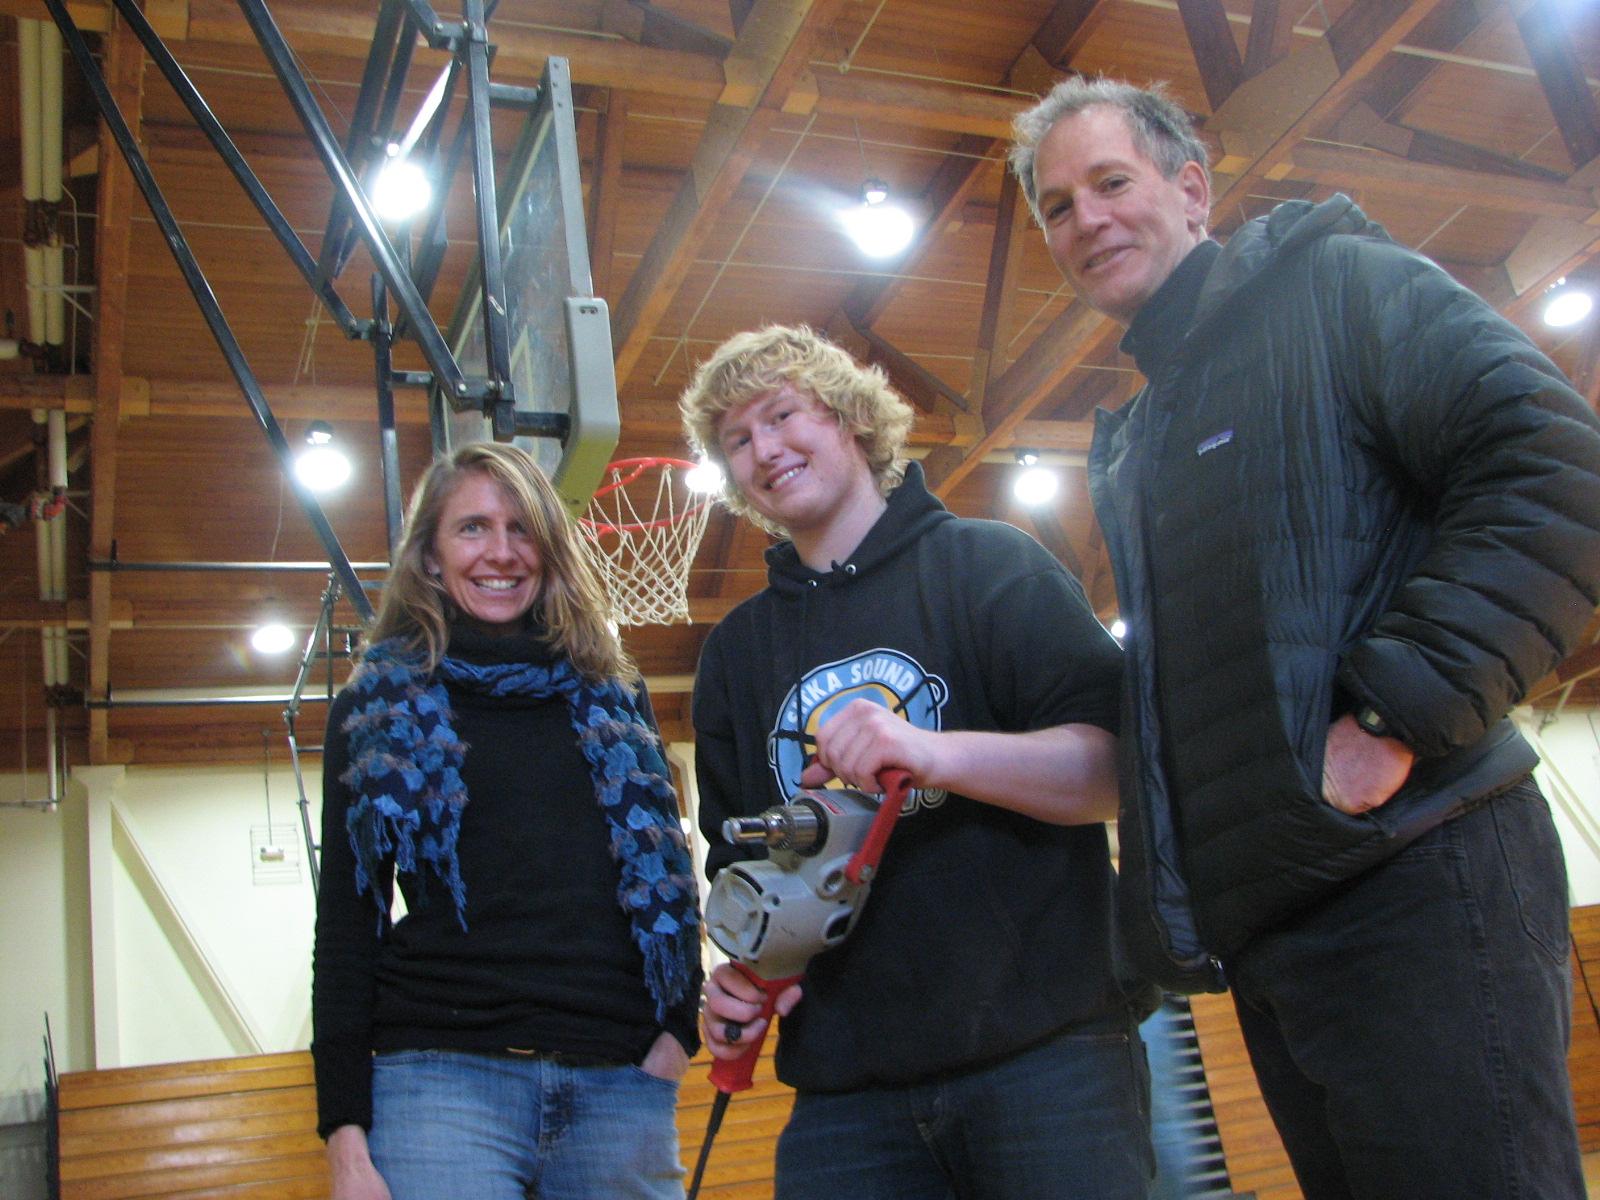 Shop students raise a bit of hoop-la at Sitka gym